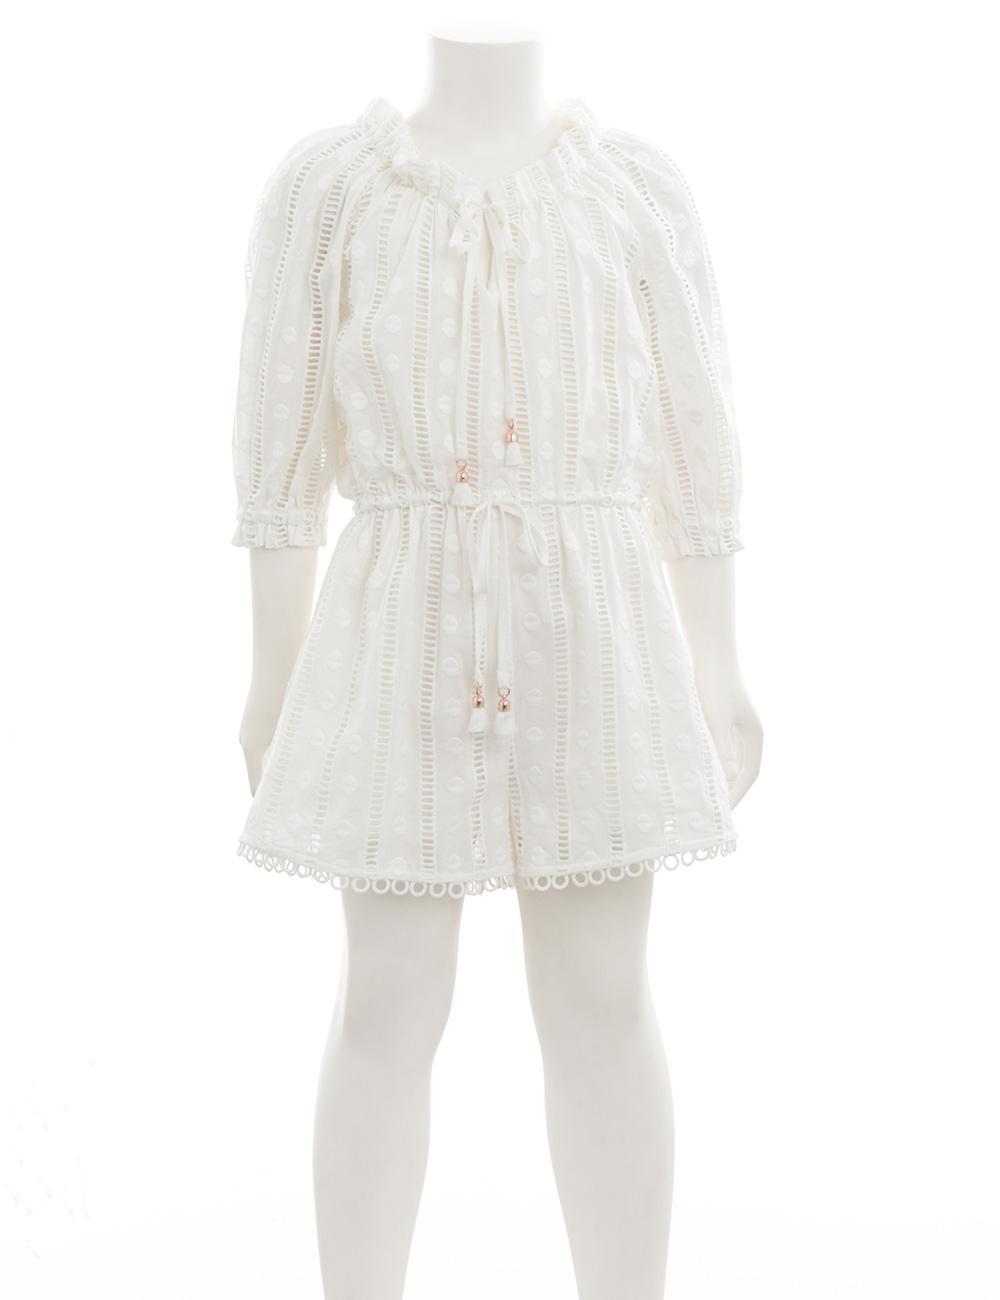 be8c7932018 Lyst - Zimmermann Primrose Long Sleeve Playsuit in White